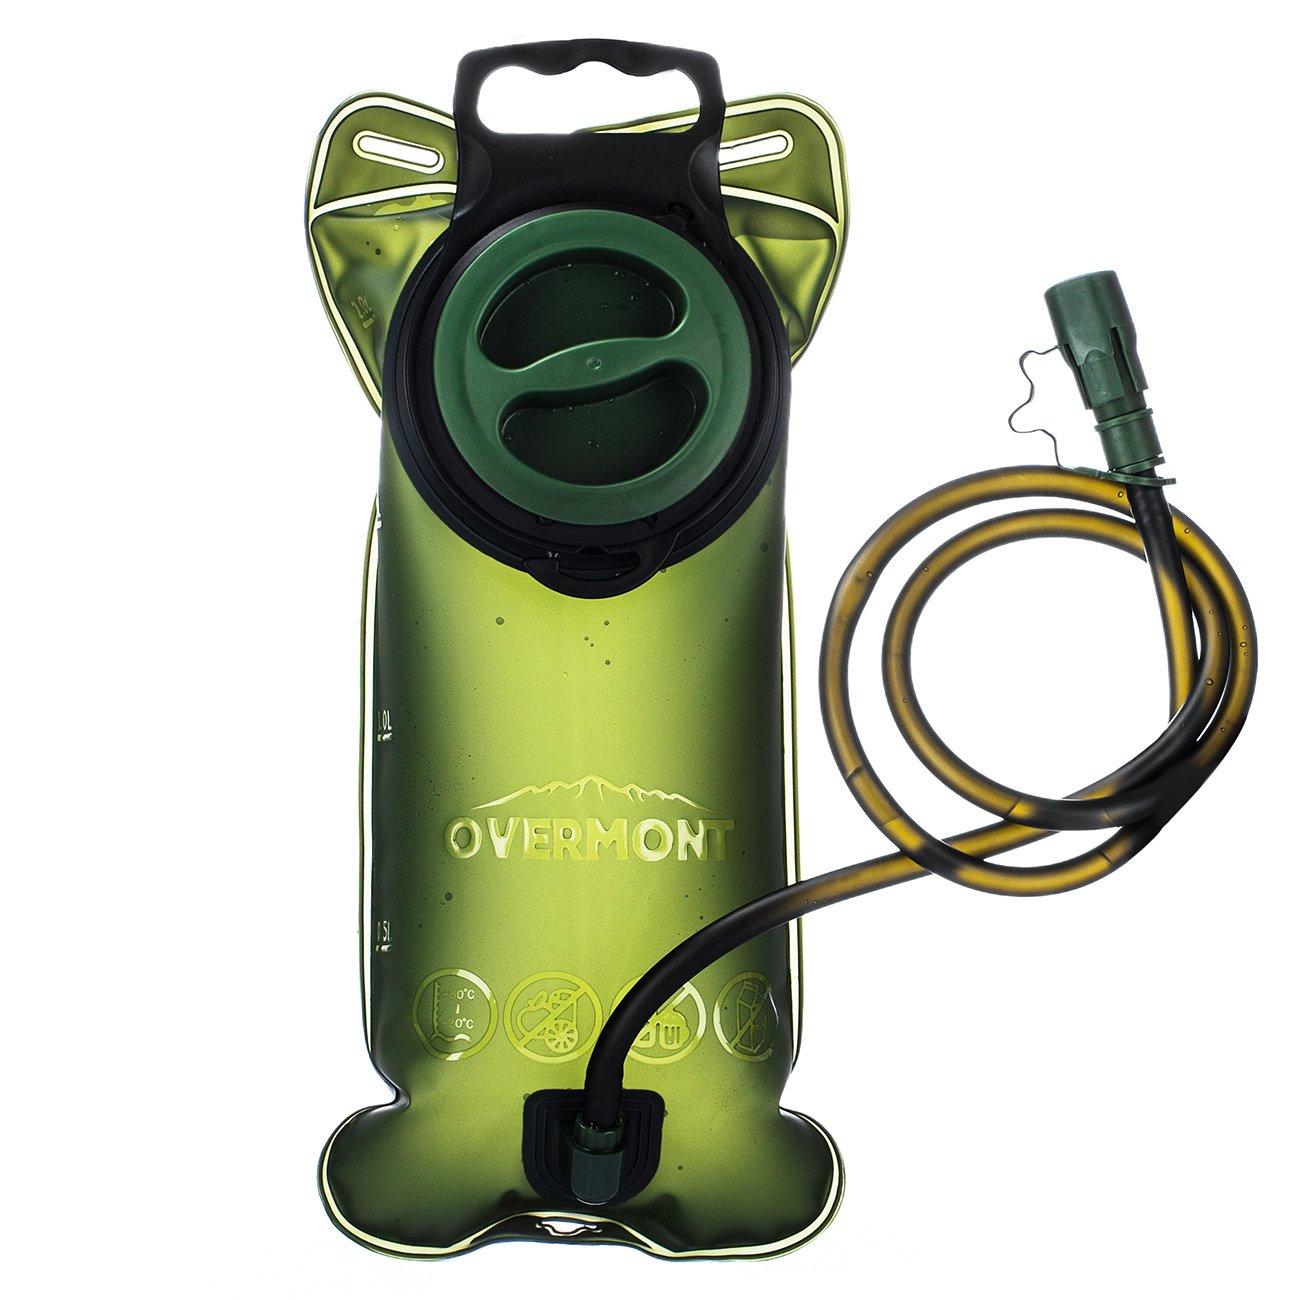 Overmont Vejiga de Agua para Camping Mochila al Aire Libre Bolso de Agua de TPU 2L Verde